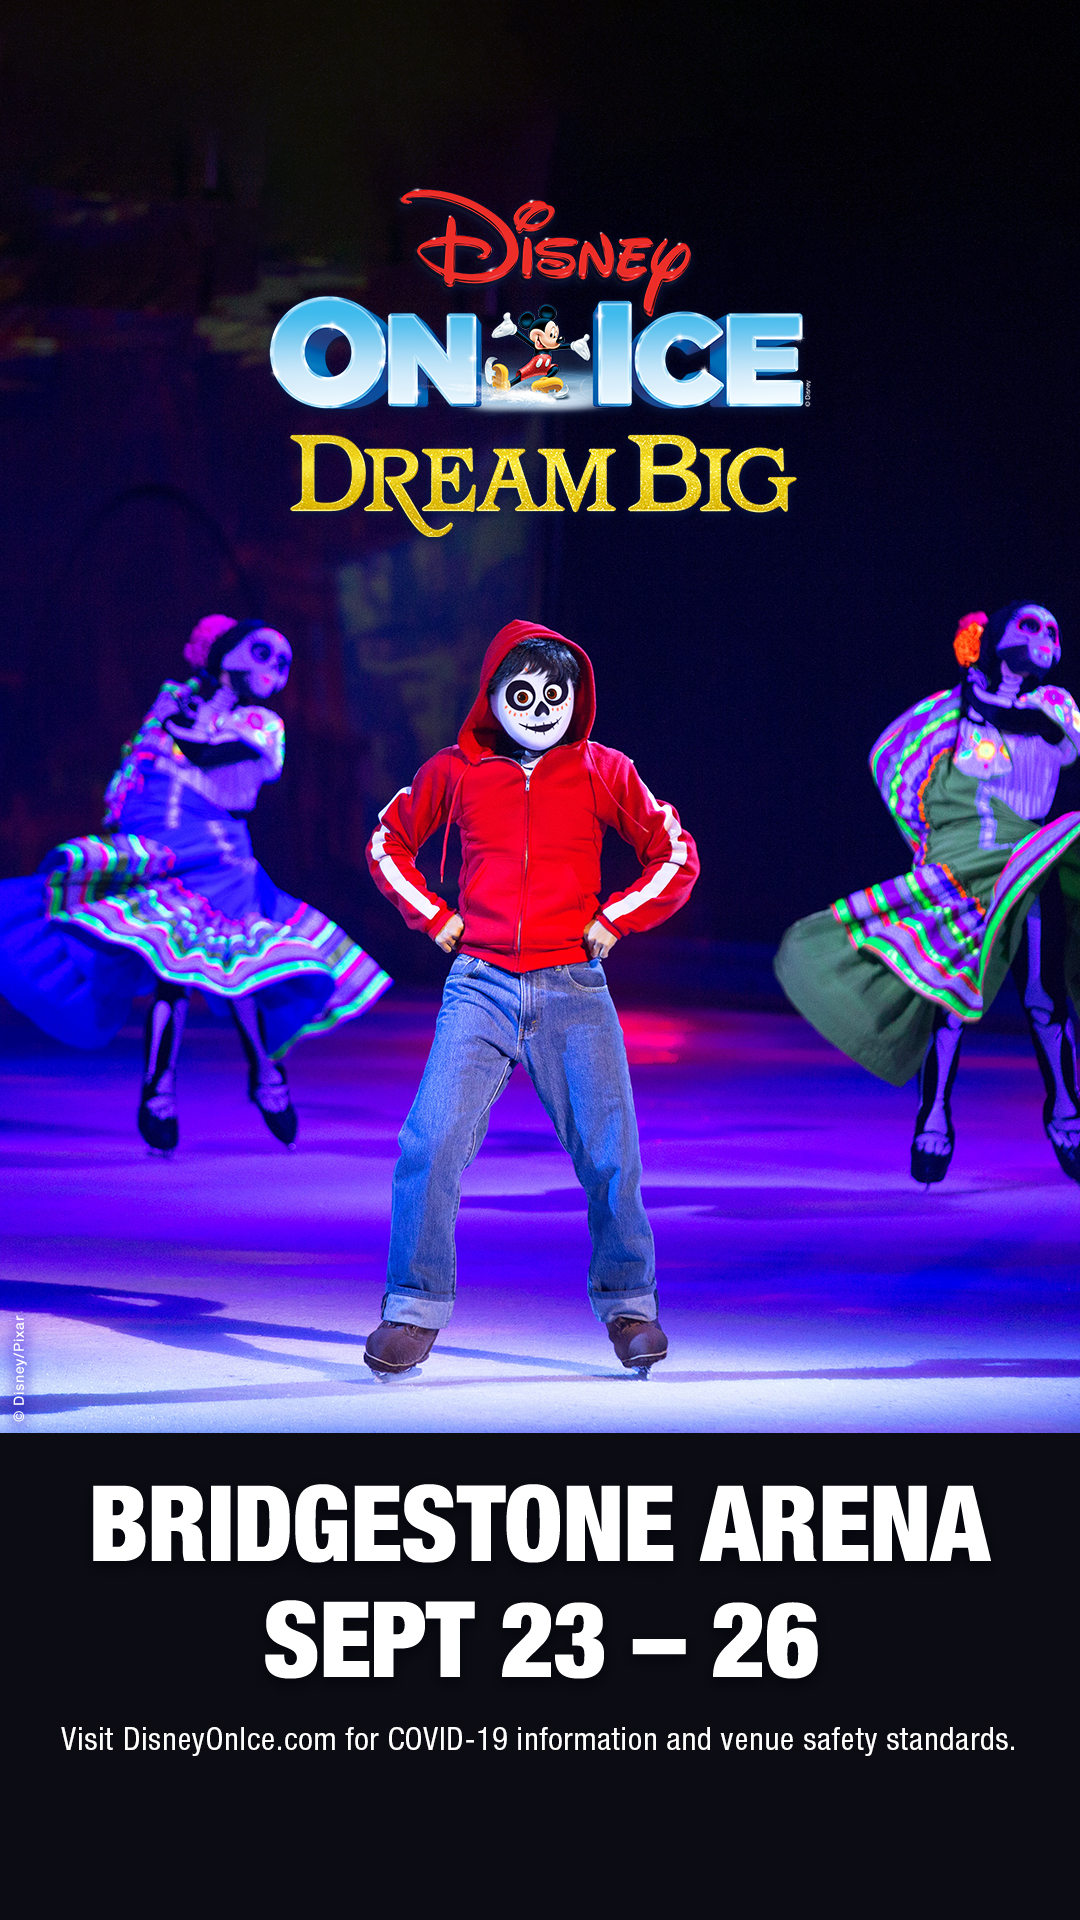 Disney on Ice: DREAM BIG! at Bridgestone Arena